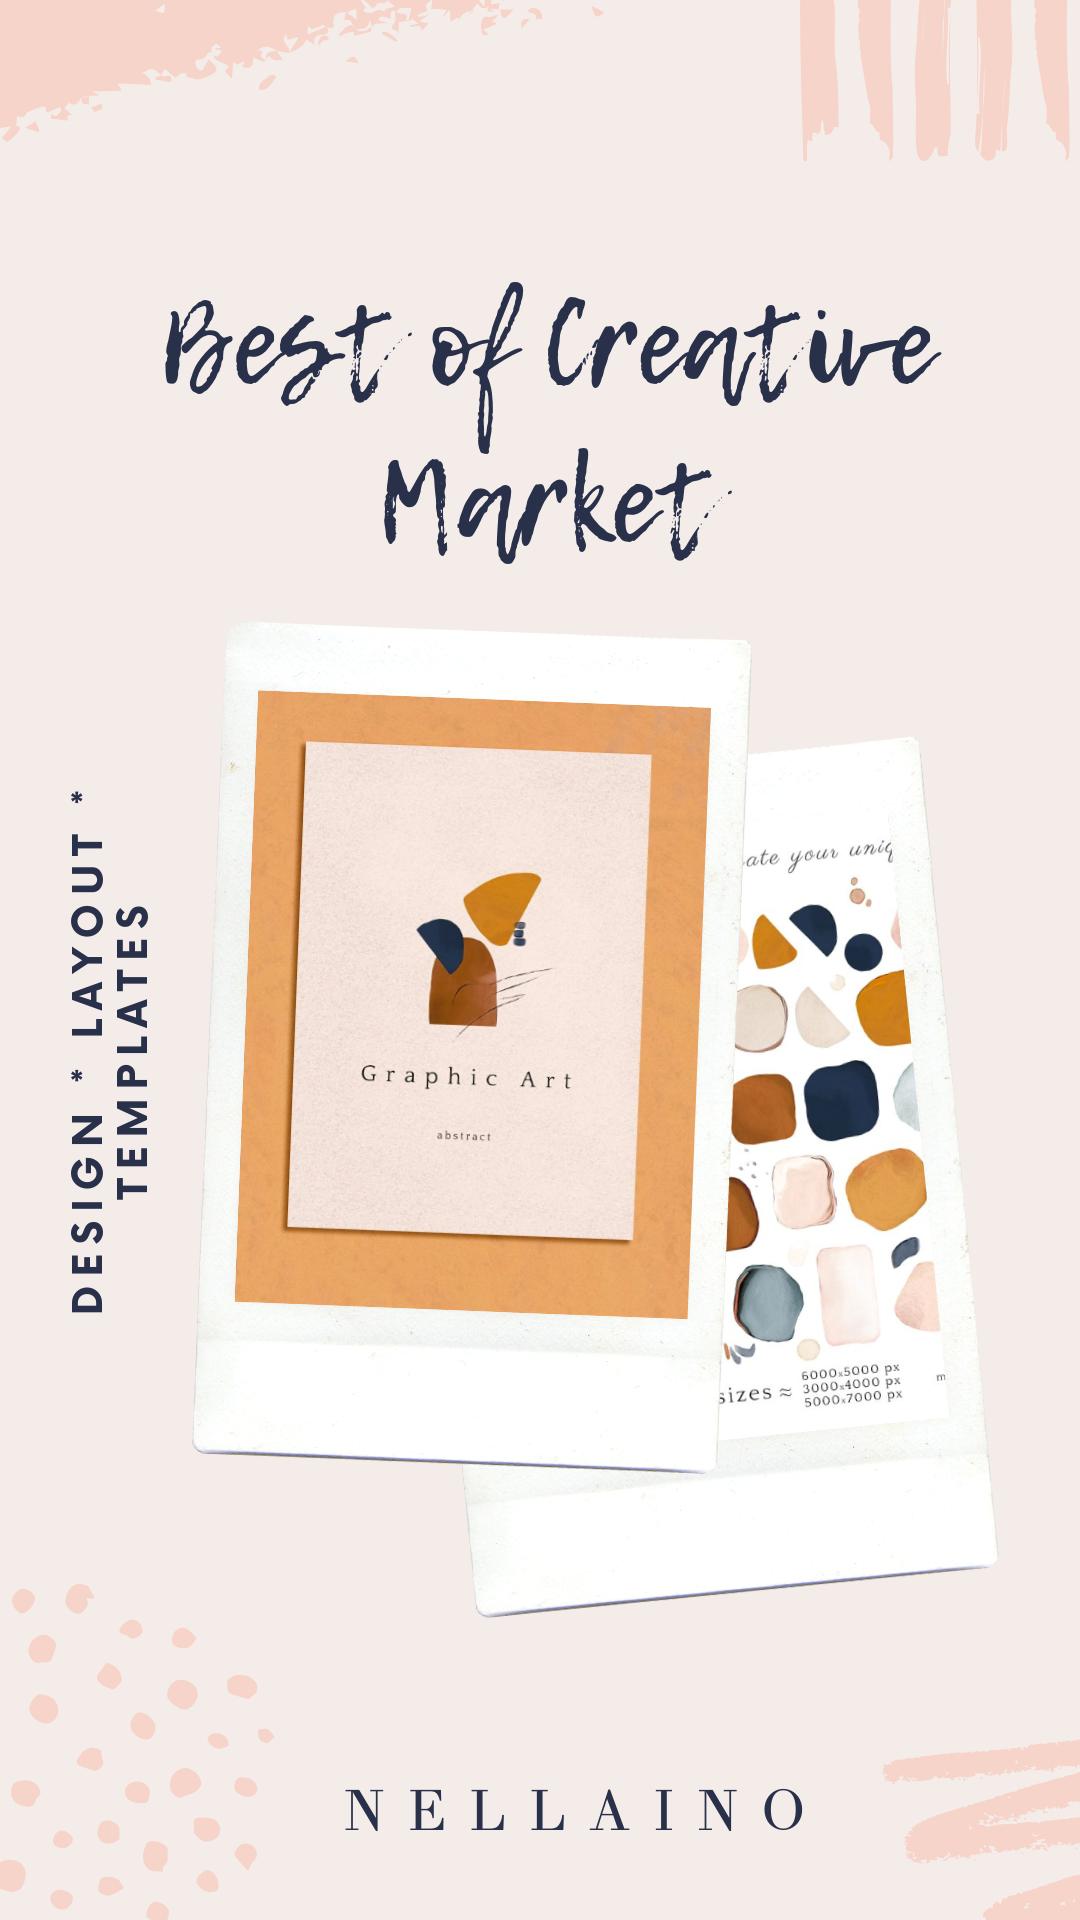 Best of Creative Market from Nellaino www.nellaino.com  (1).png